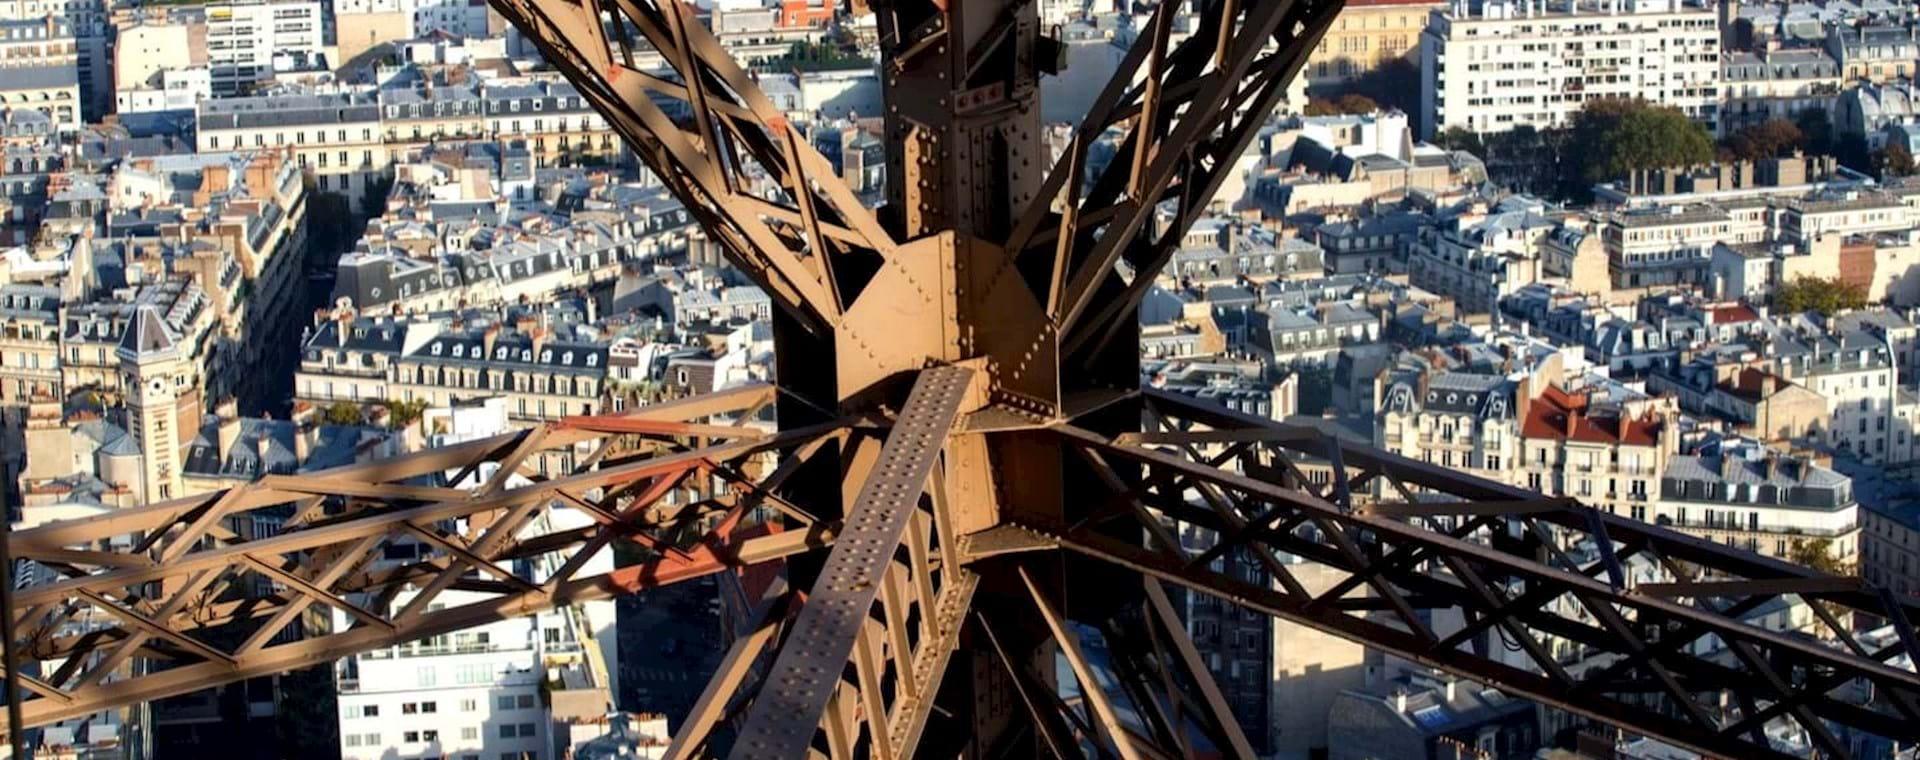 Subida a la Cima de la Torre Eiffel